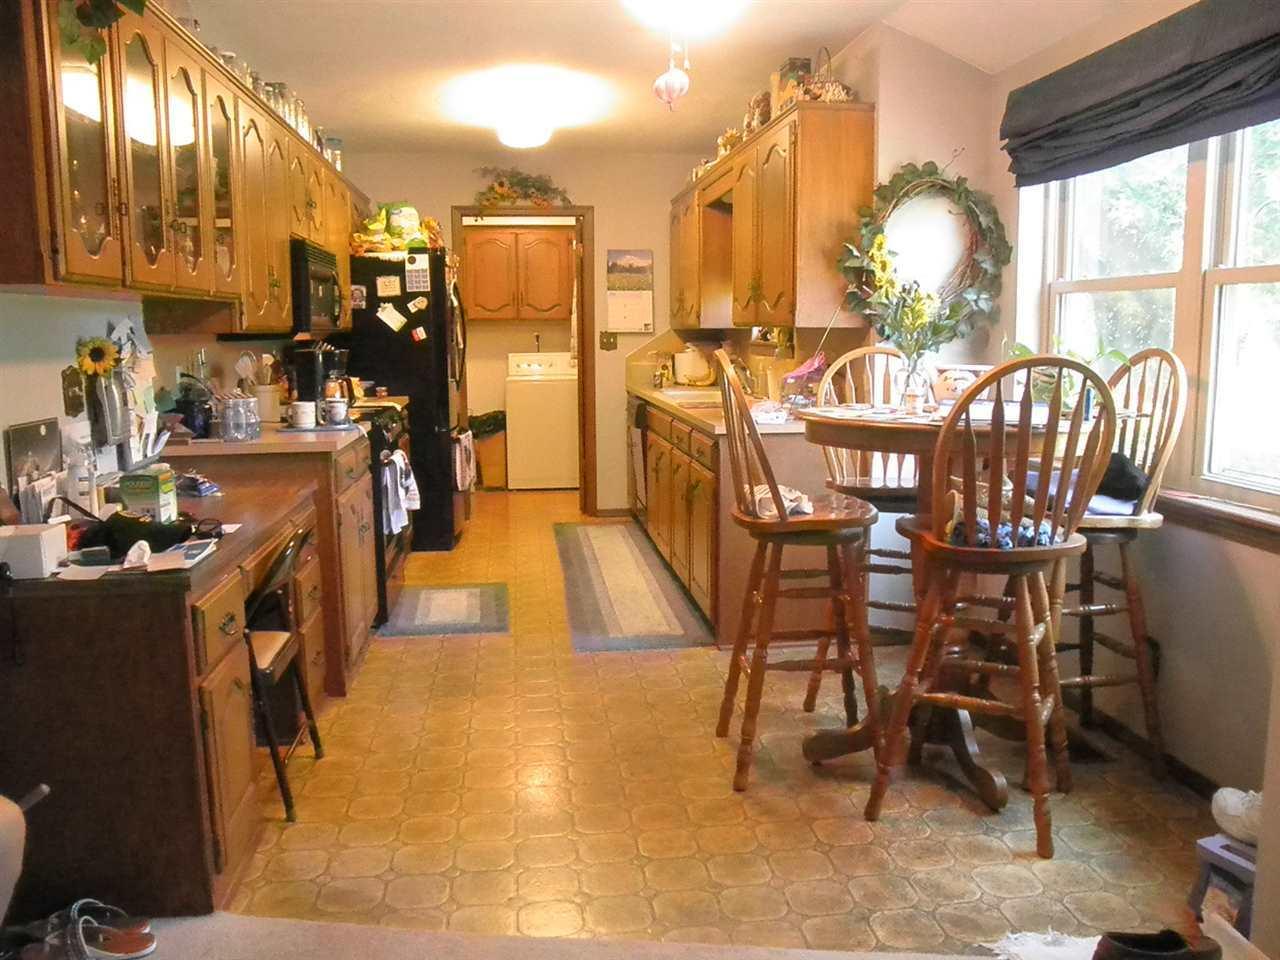 Sold Intraoffice W/MLS | 7 Raintree Ponca City, OK 74604 14